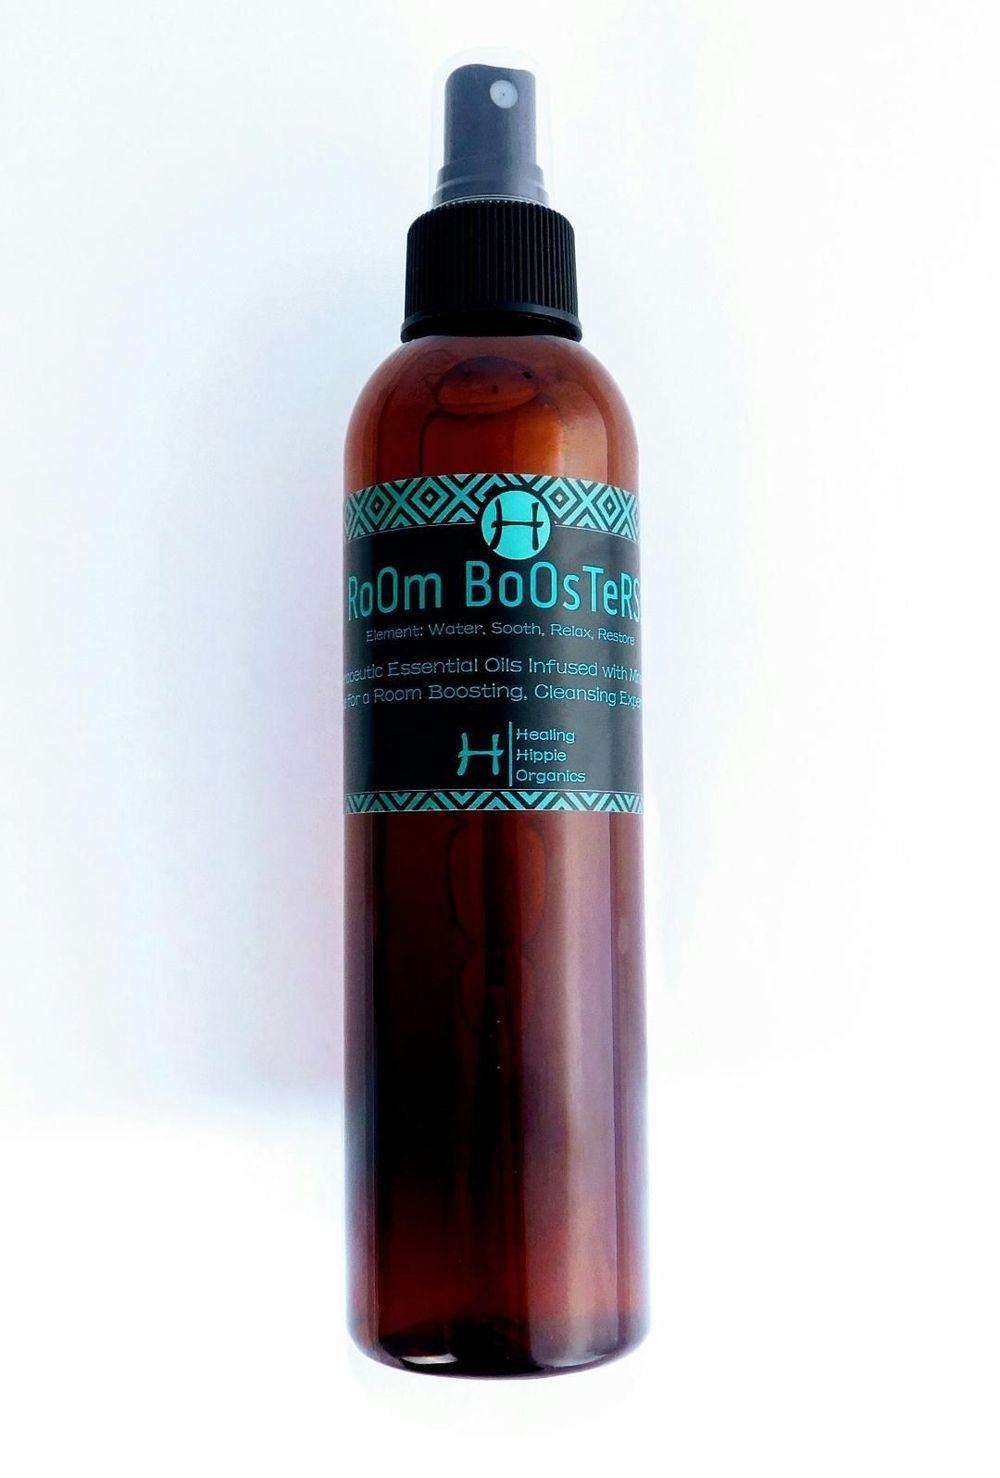 Room Boosters, Healing Hippie Organics, Boise, Idaho, USA